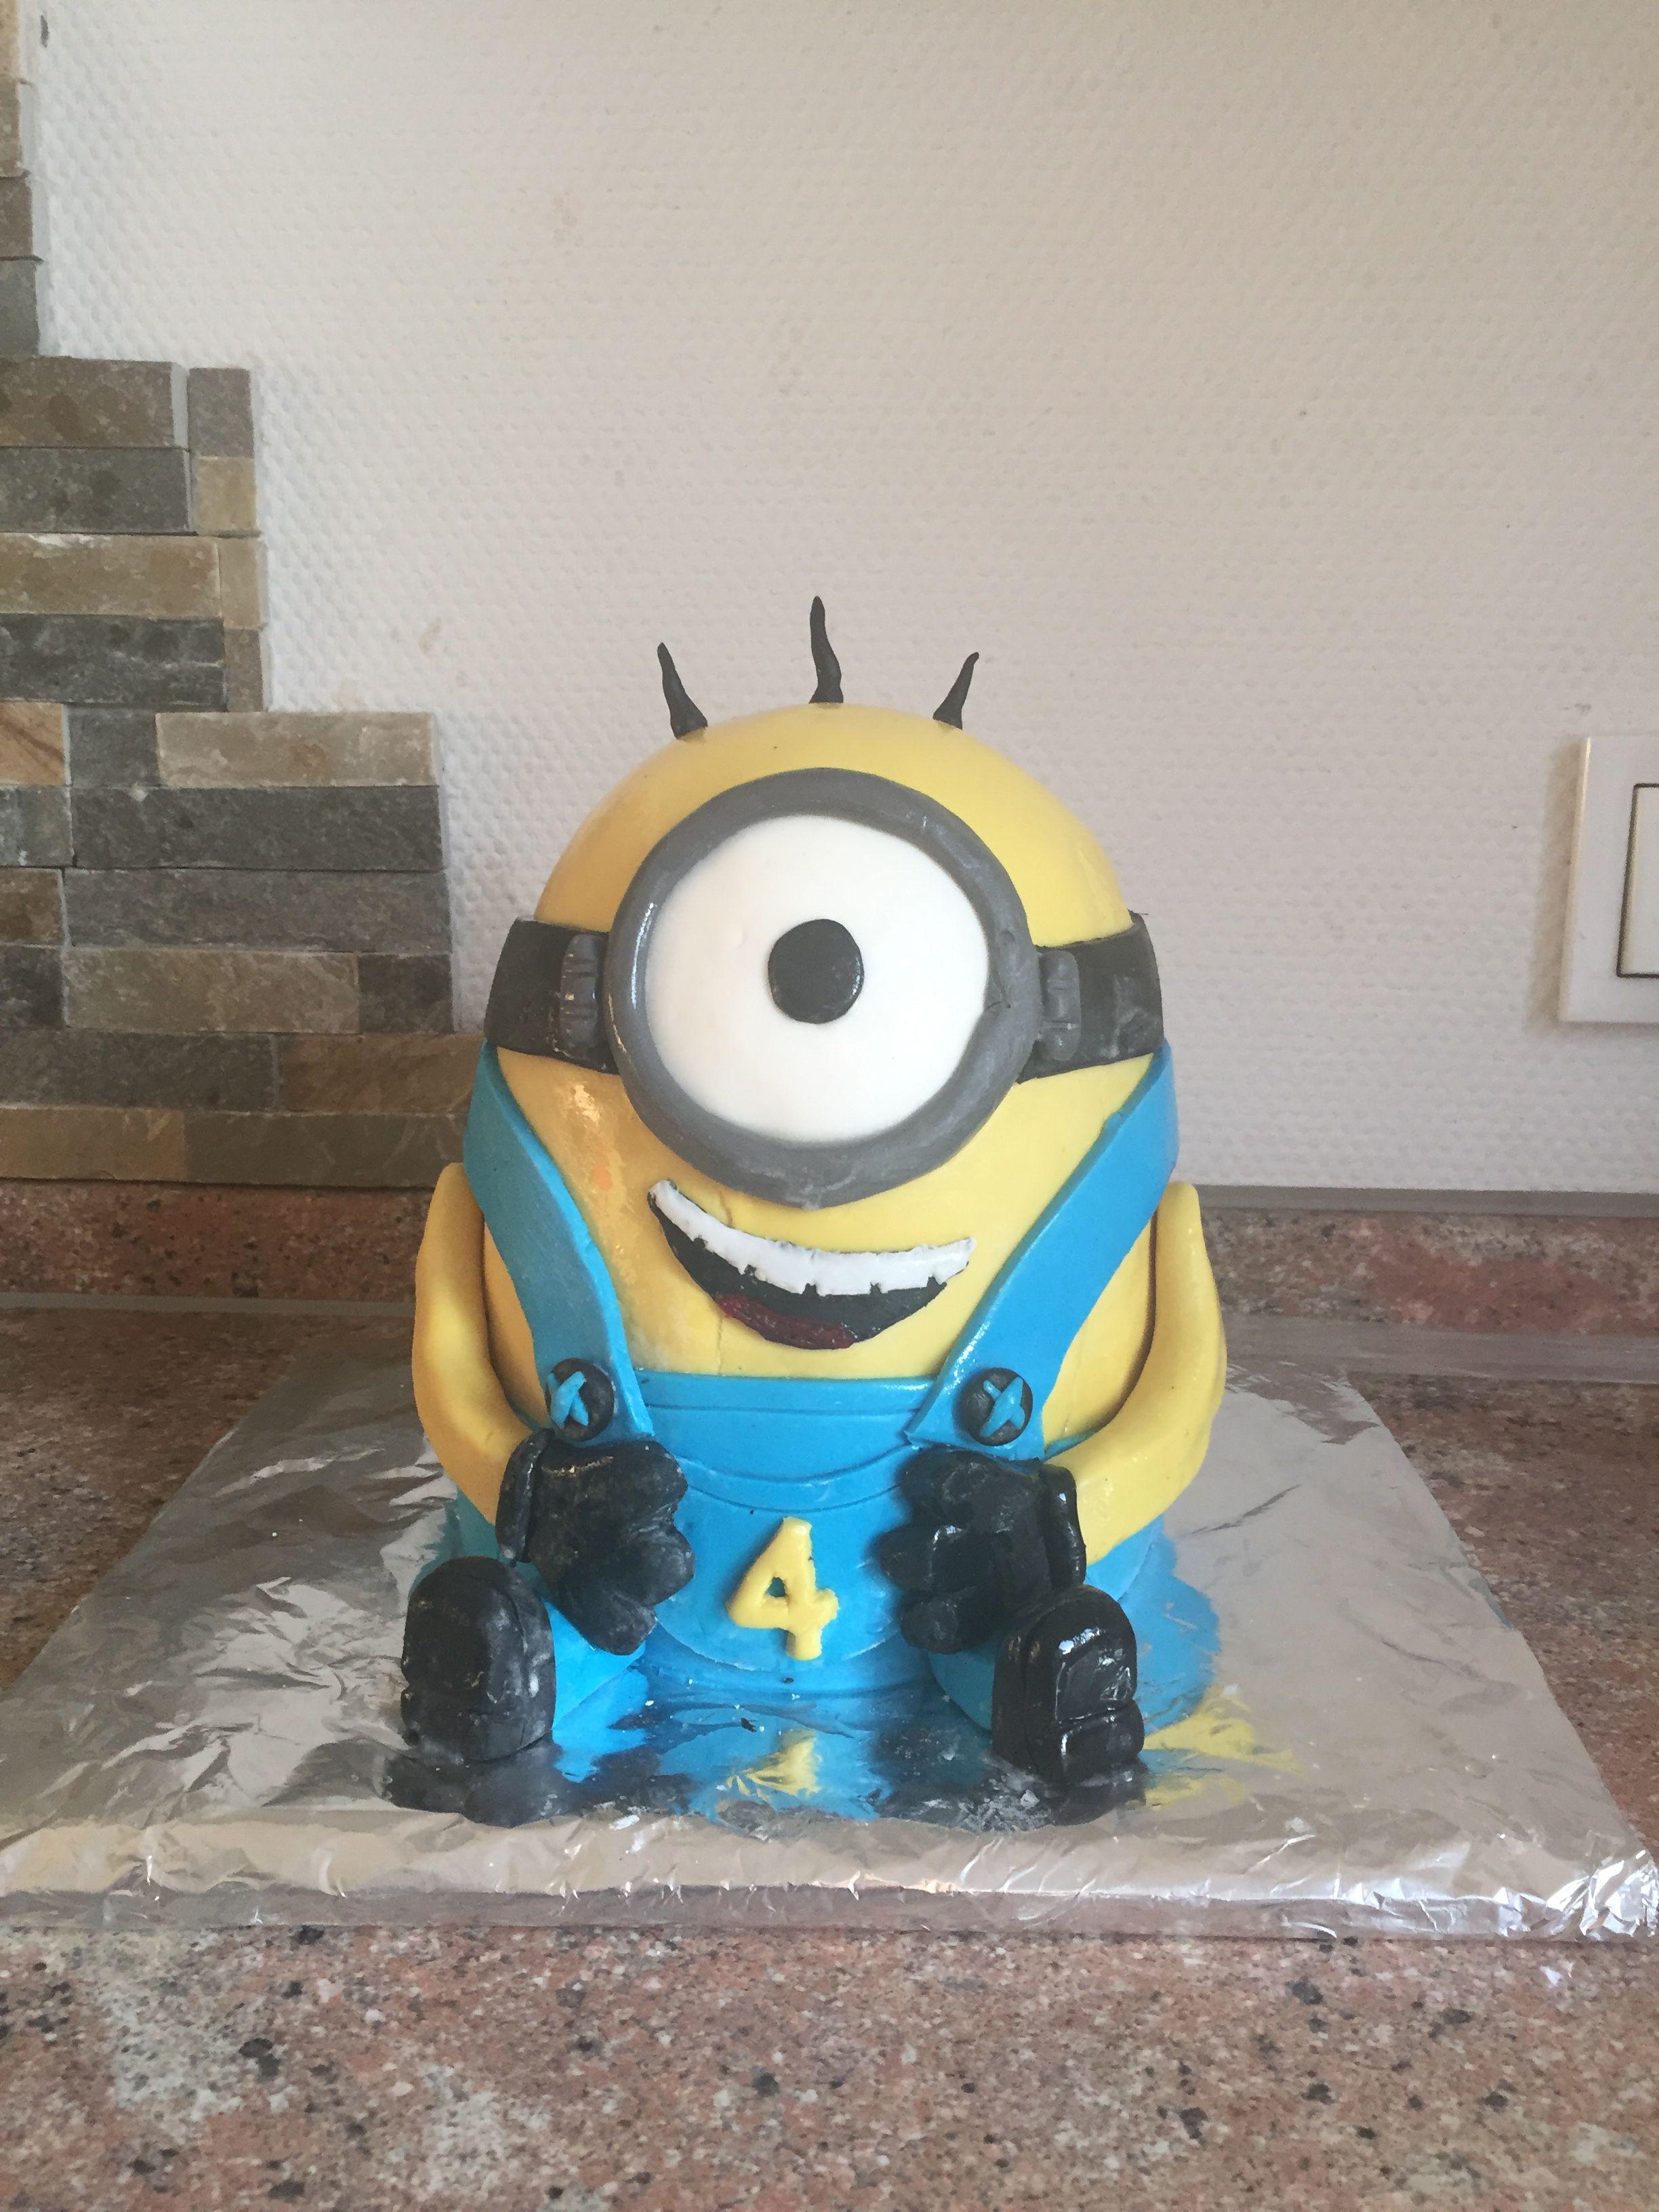 Minions Torte Selber Backen Sandy 39s Kitchendreams Minion Kuchen